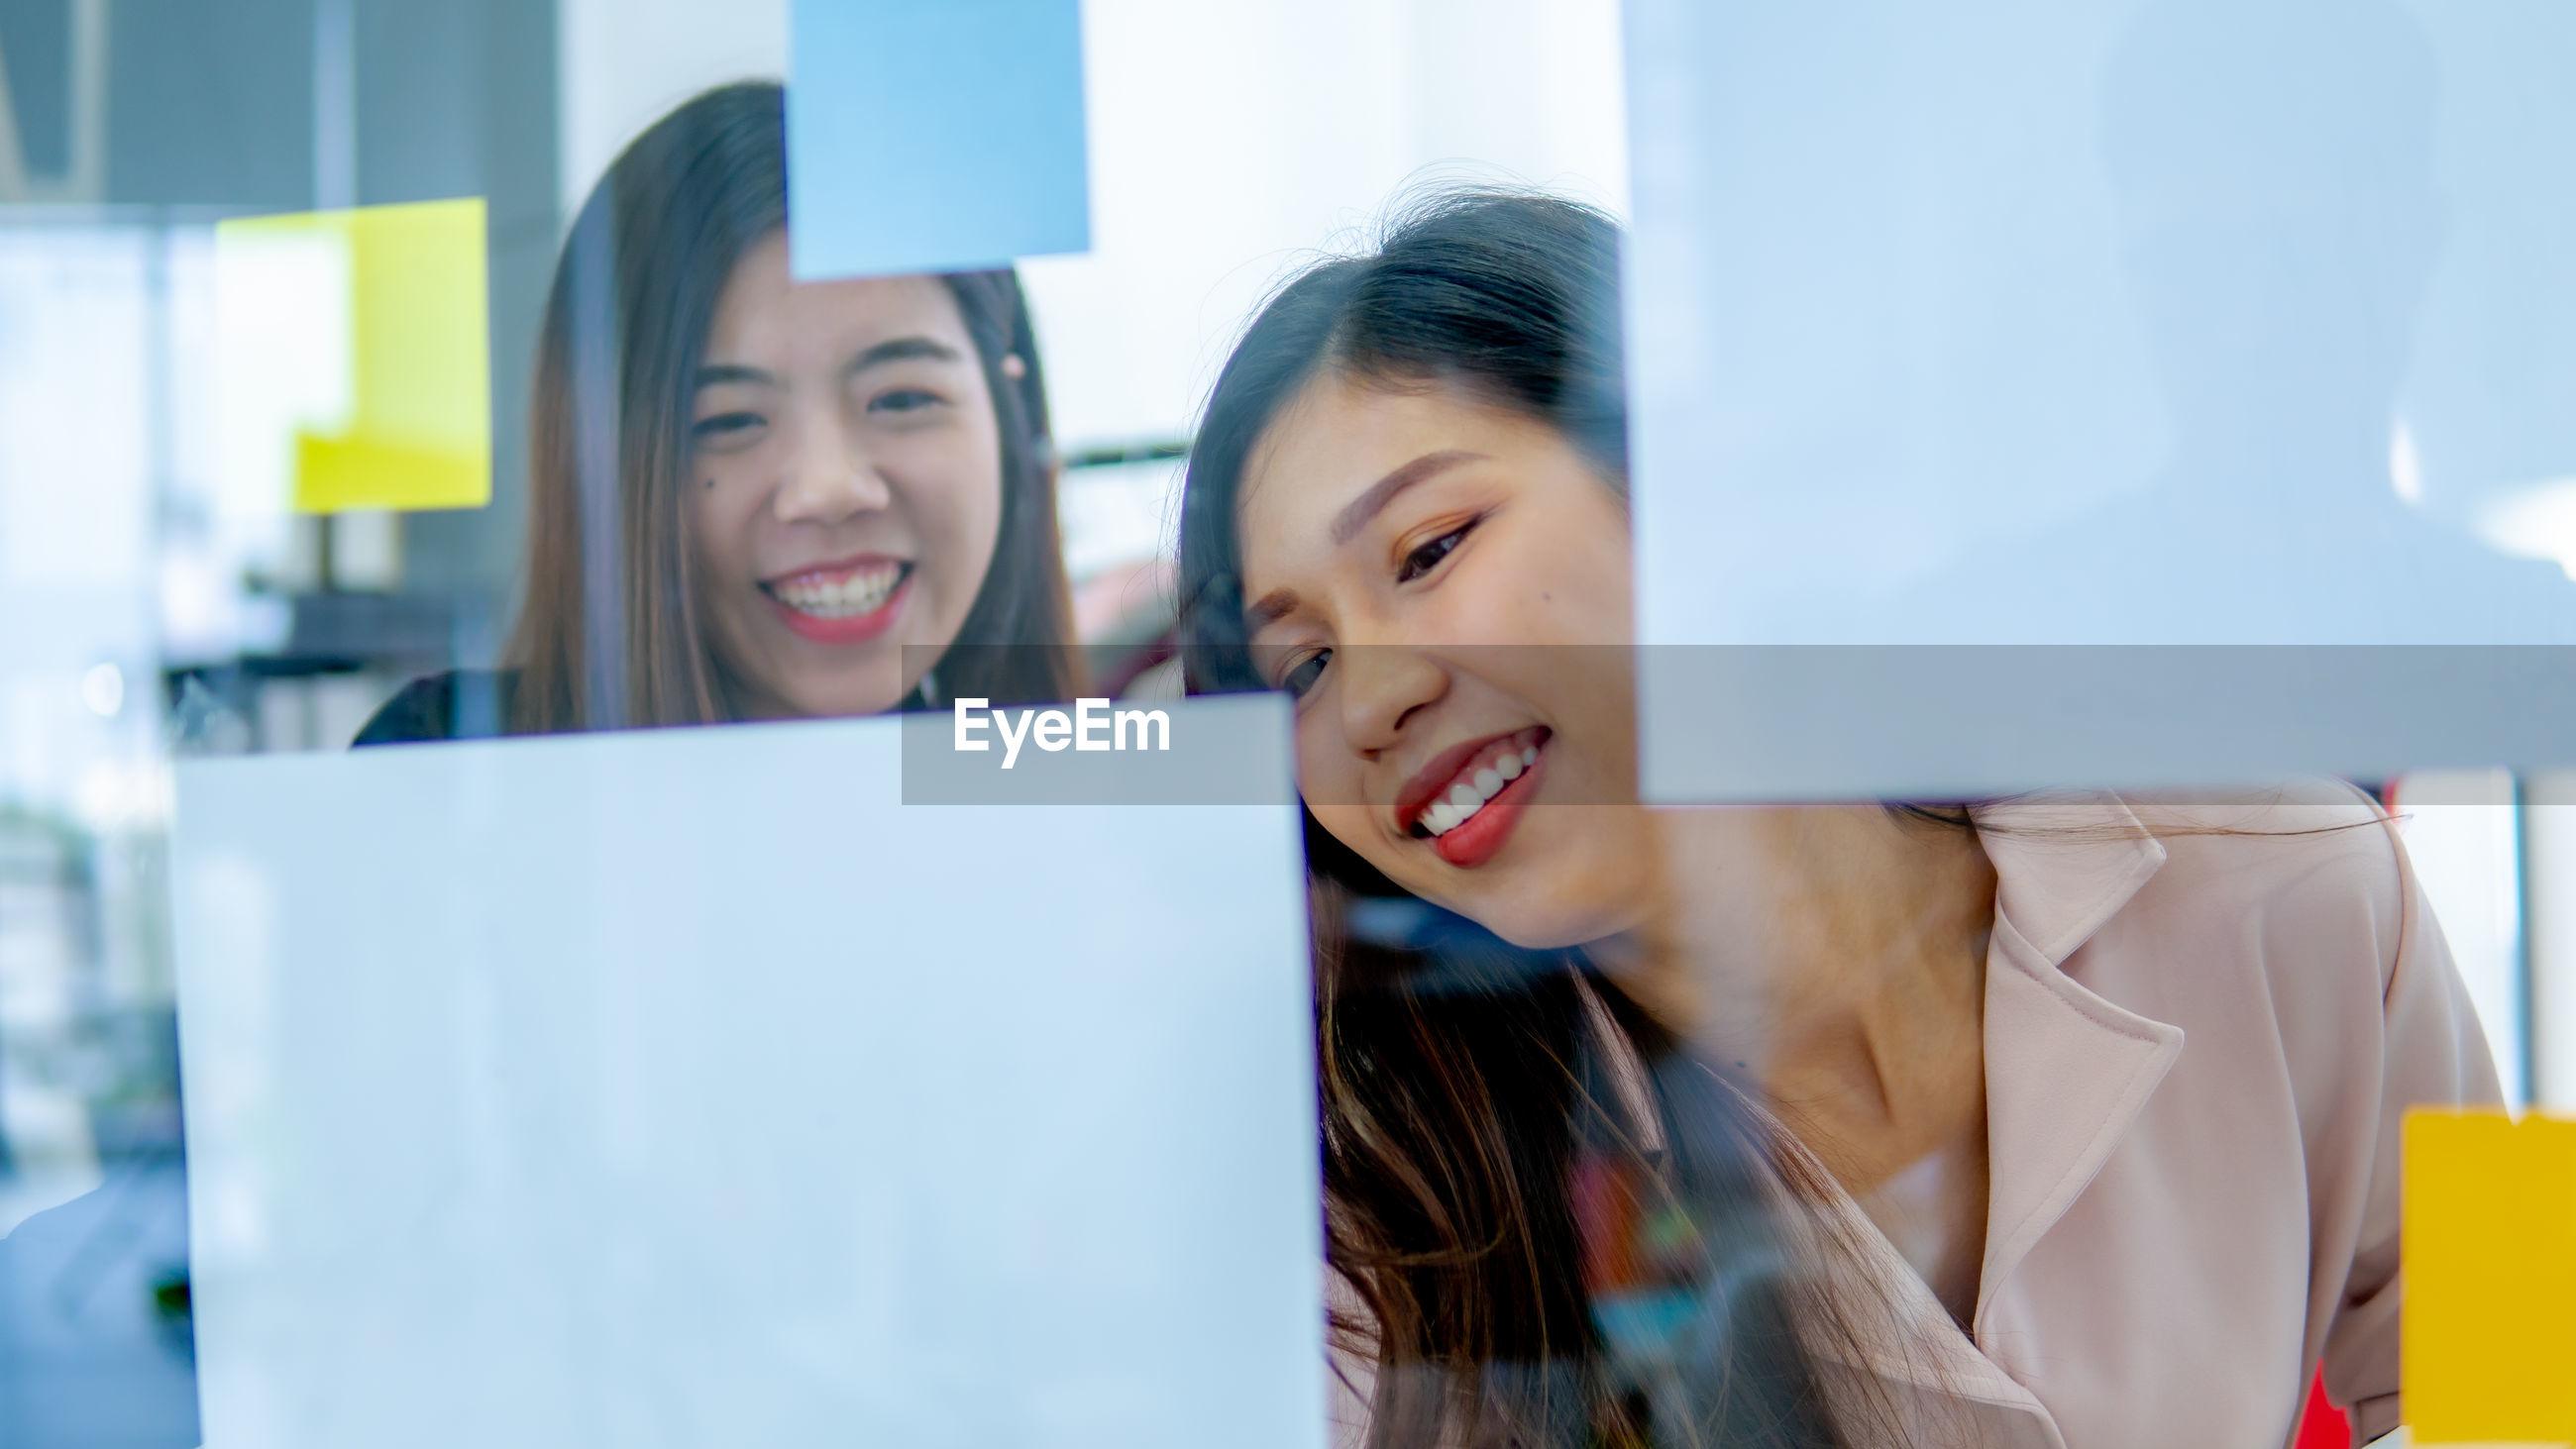 Smiling women working seen through glass